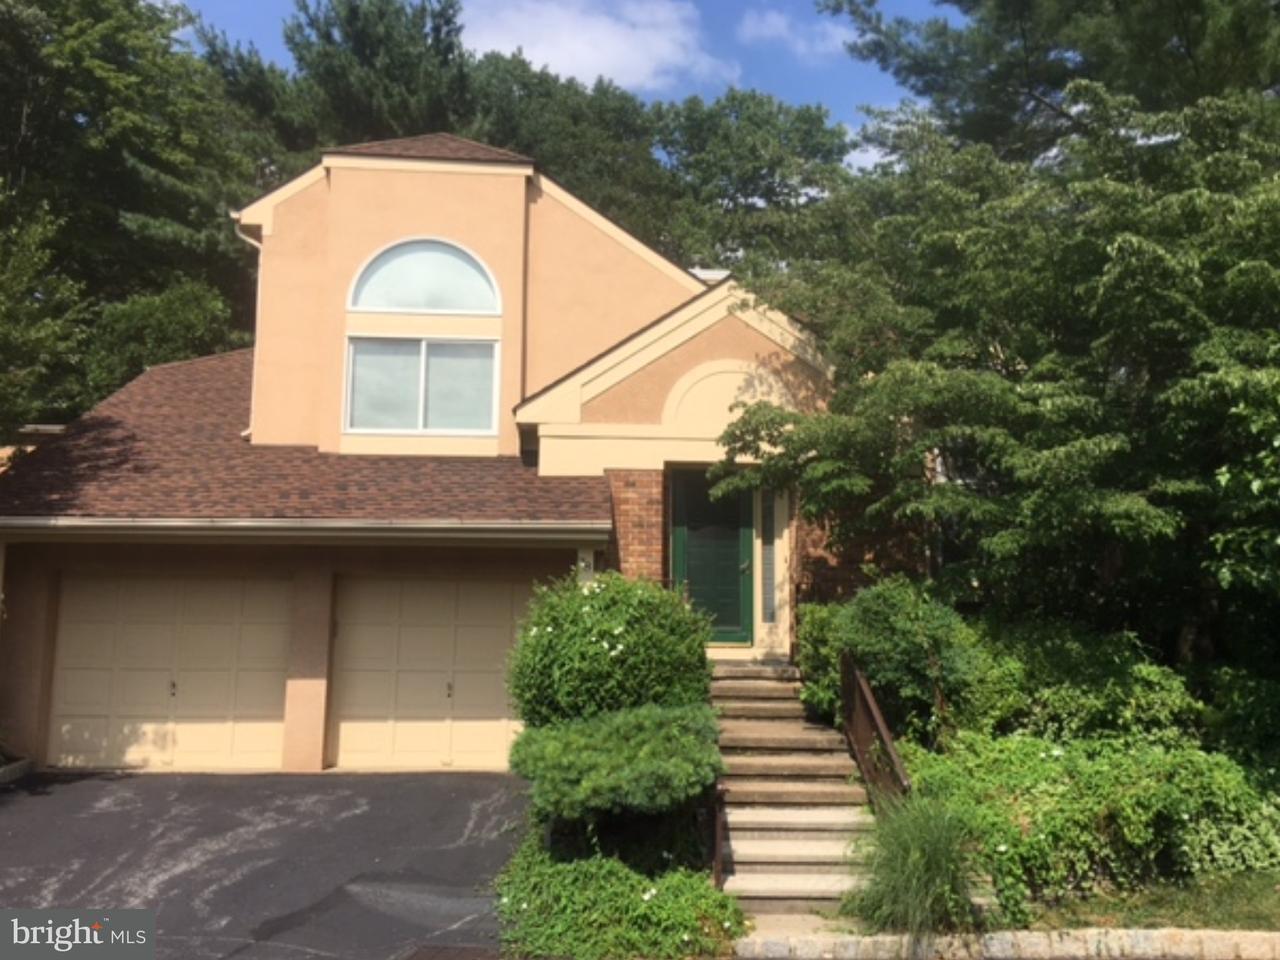 Condomínio para Venda às 78 KINGSLAND Circle Monmouth Junction, Nova Jersey 08852 Estados UnidosEm/Em torno de: South Brunswick Township